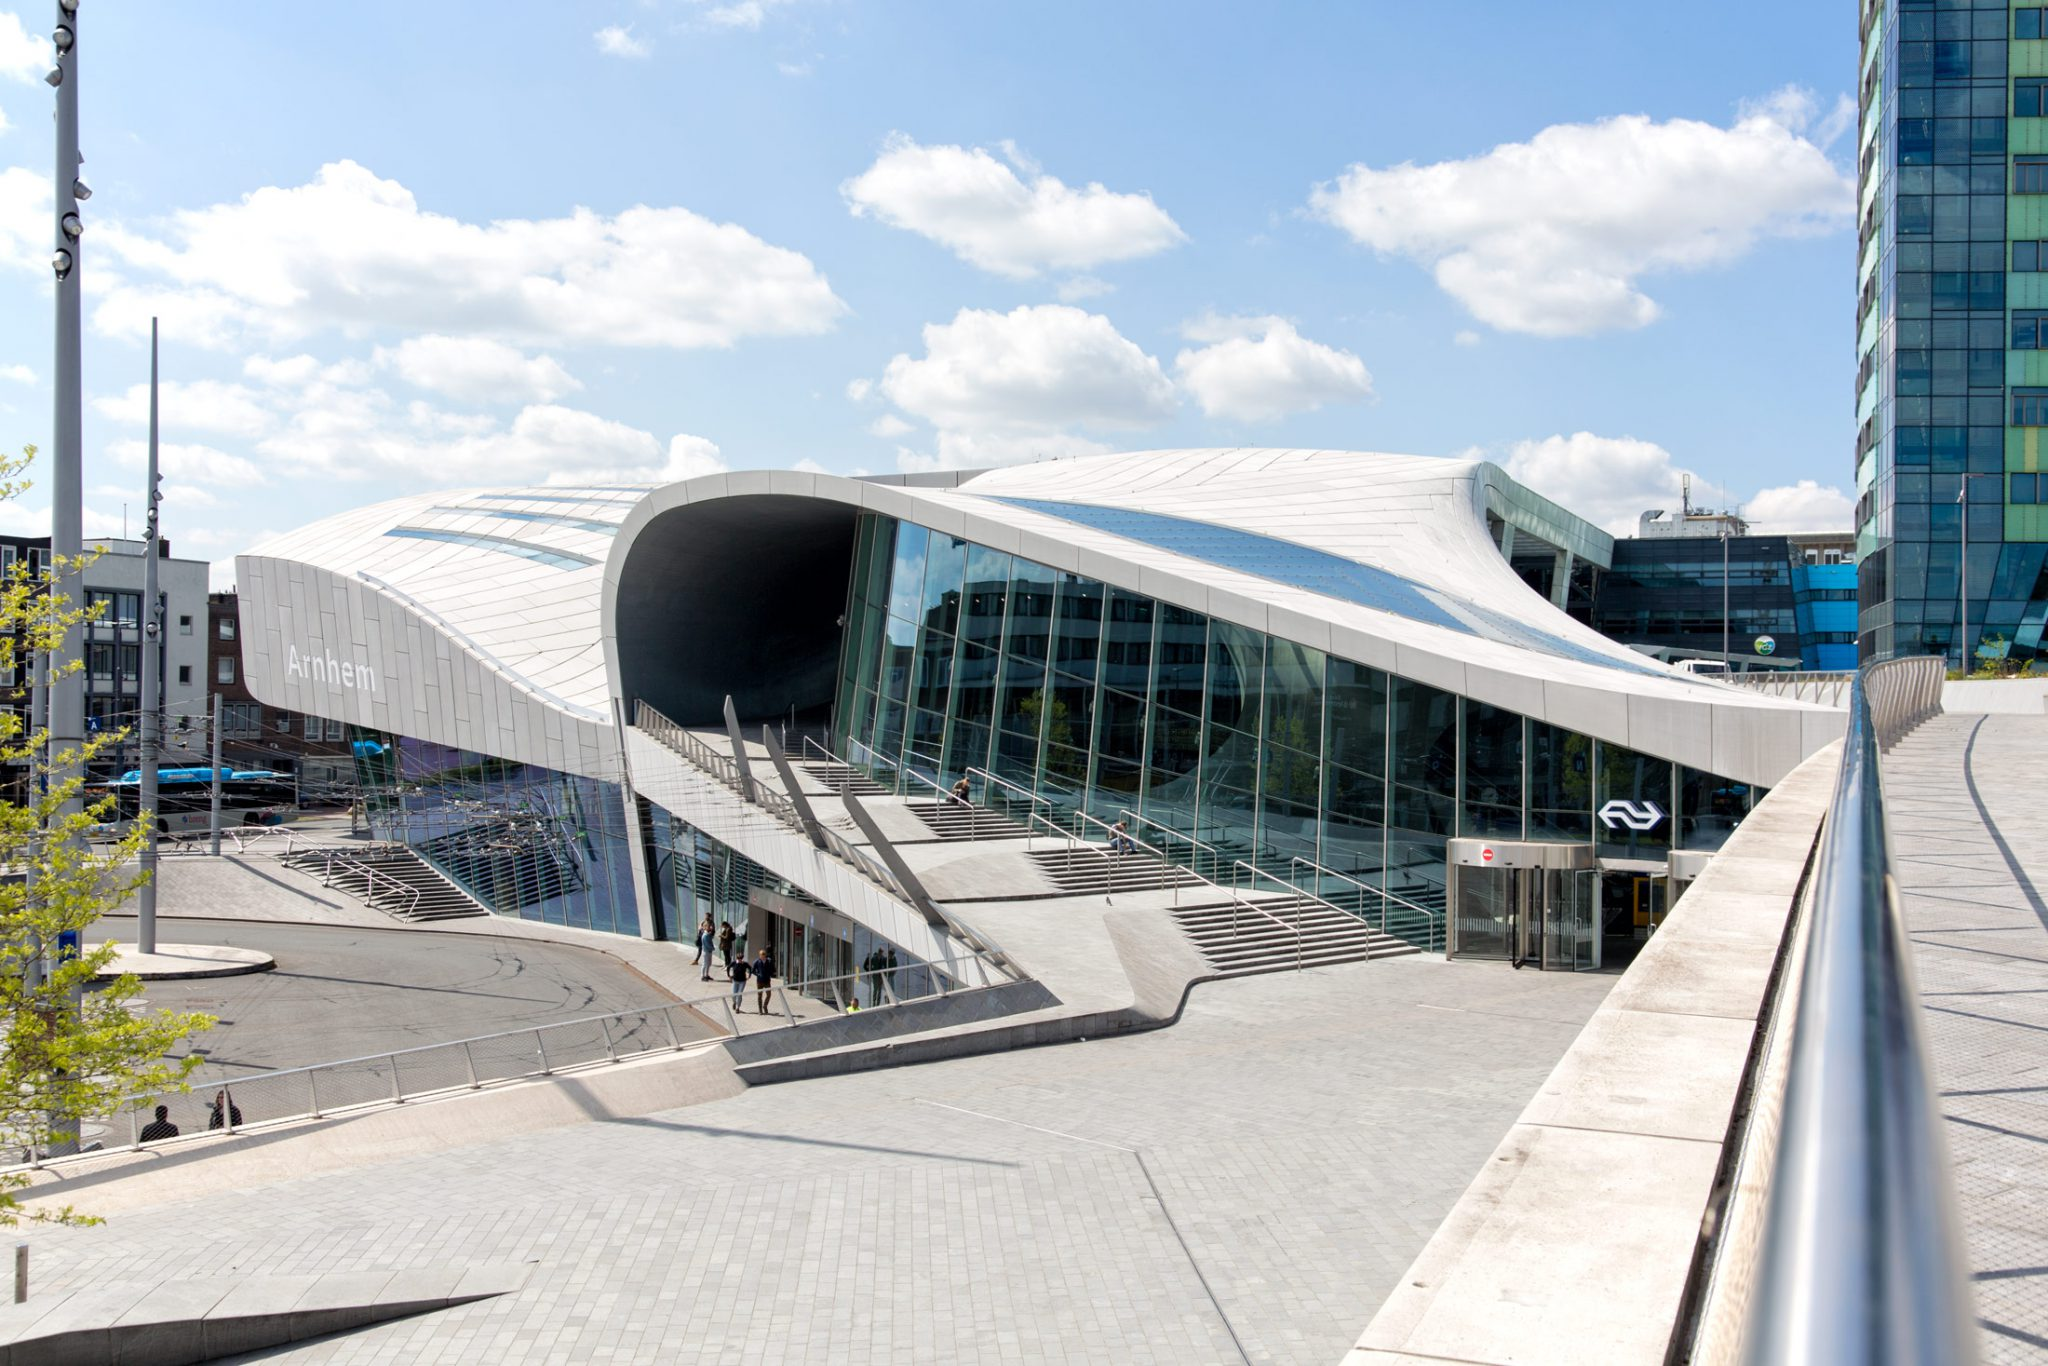 Railway Station & Public Transport terminal